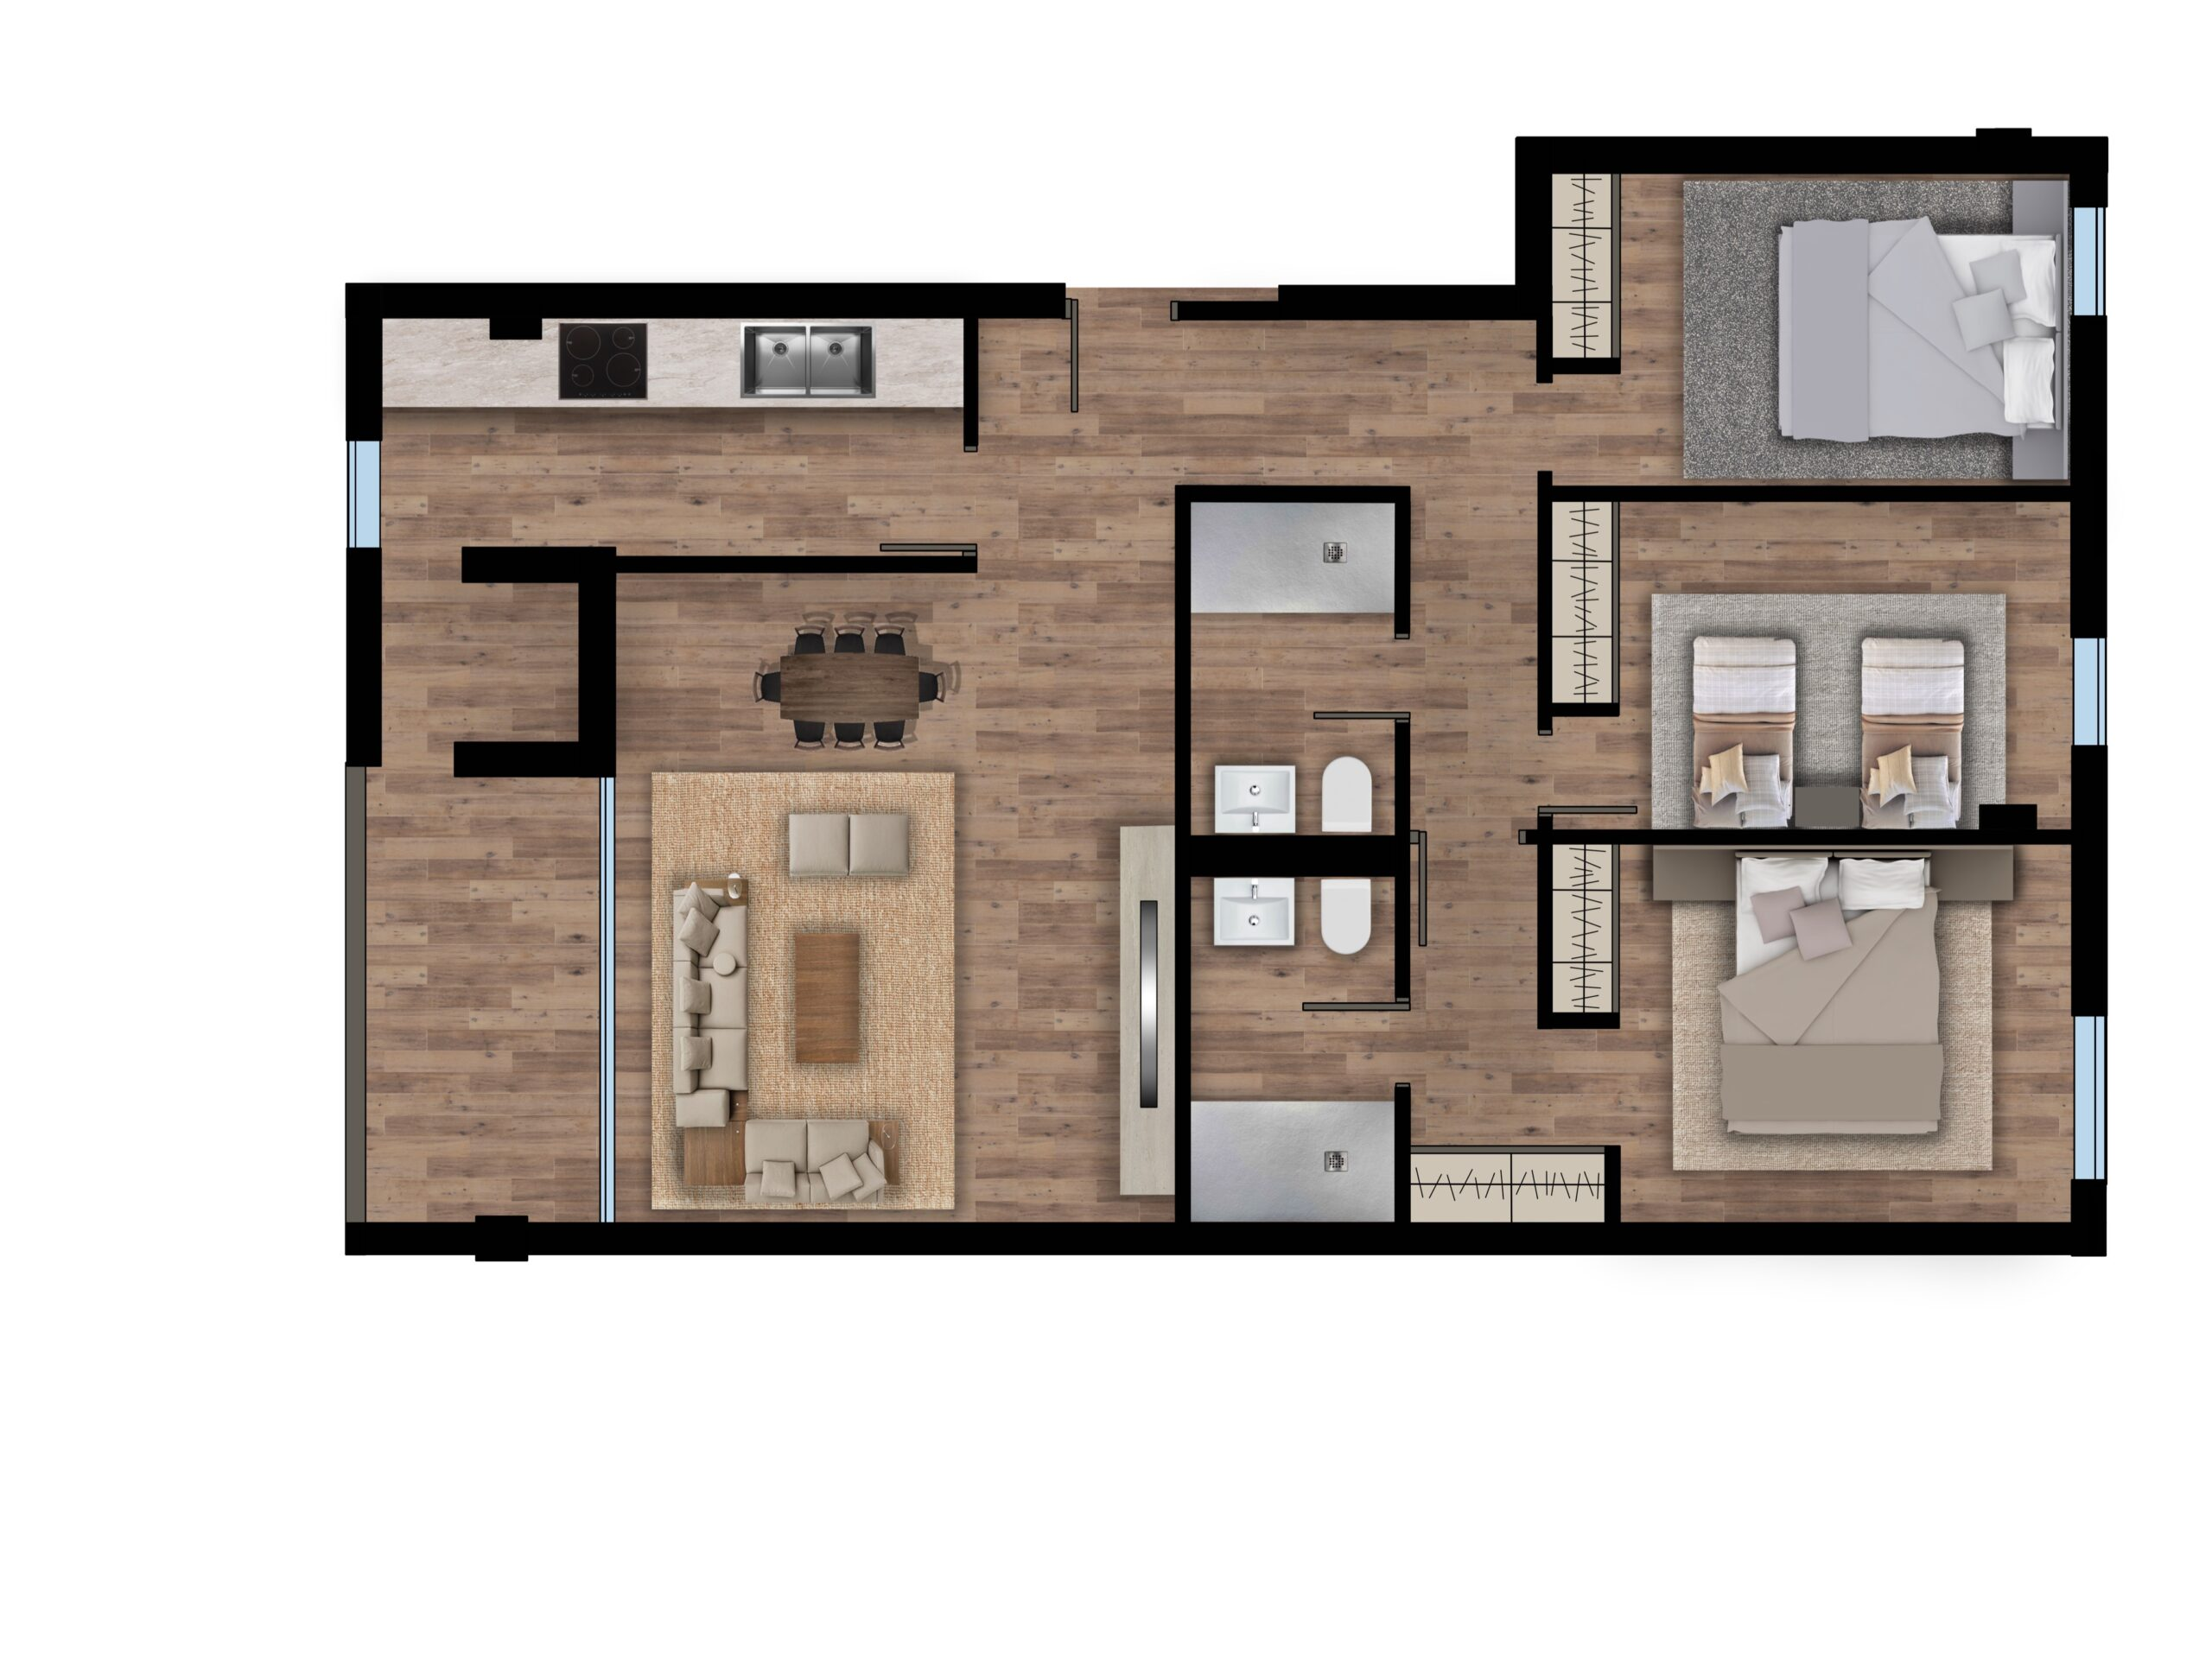 Plano 3 dormitorios Bulevar ok